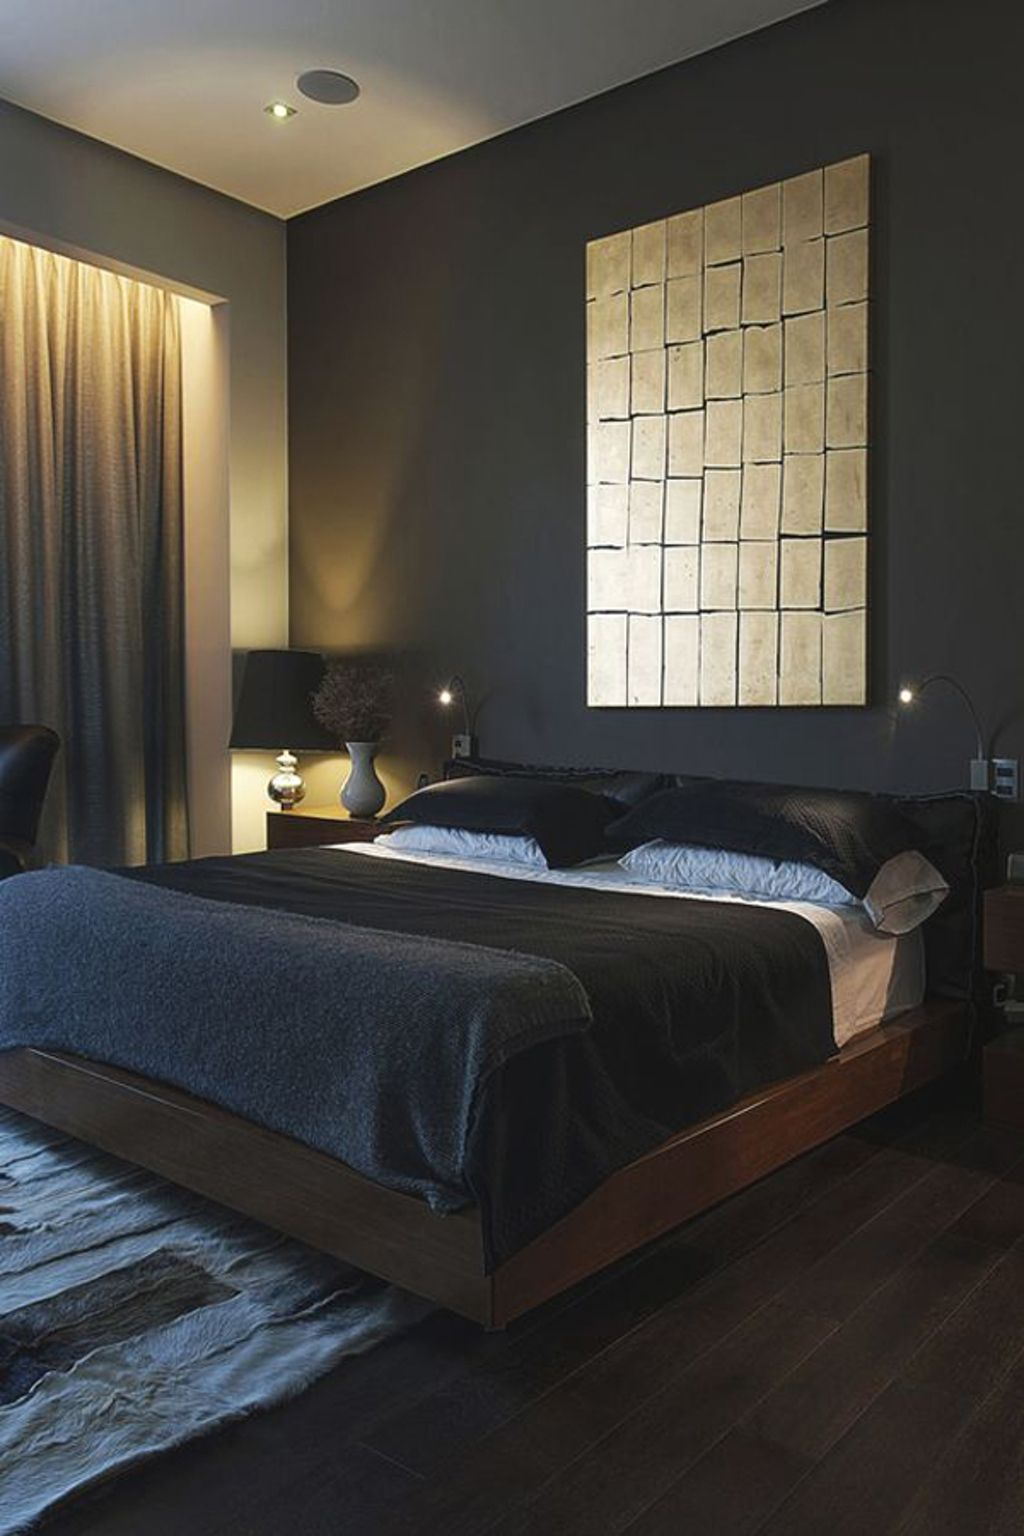 10 Masculine Bedroom Ideas Most Elegant And Beautiful Mens Bedroom Decor Luxurious Bedrooms Modern Minimalist Bedroom